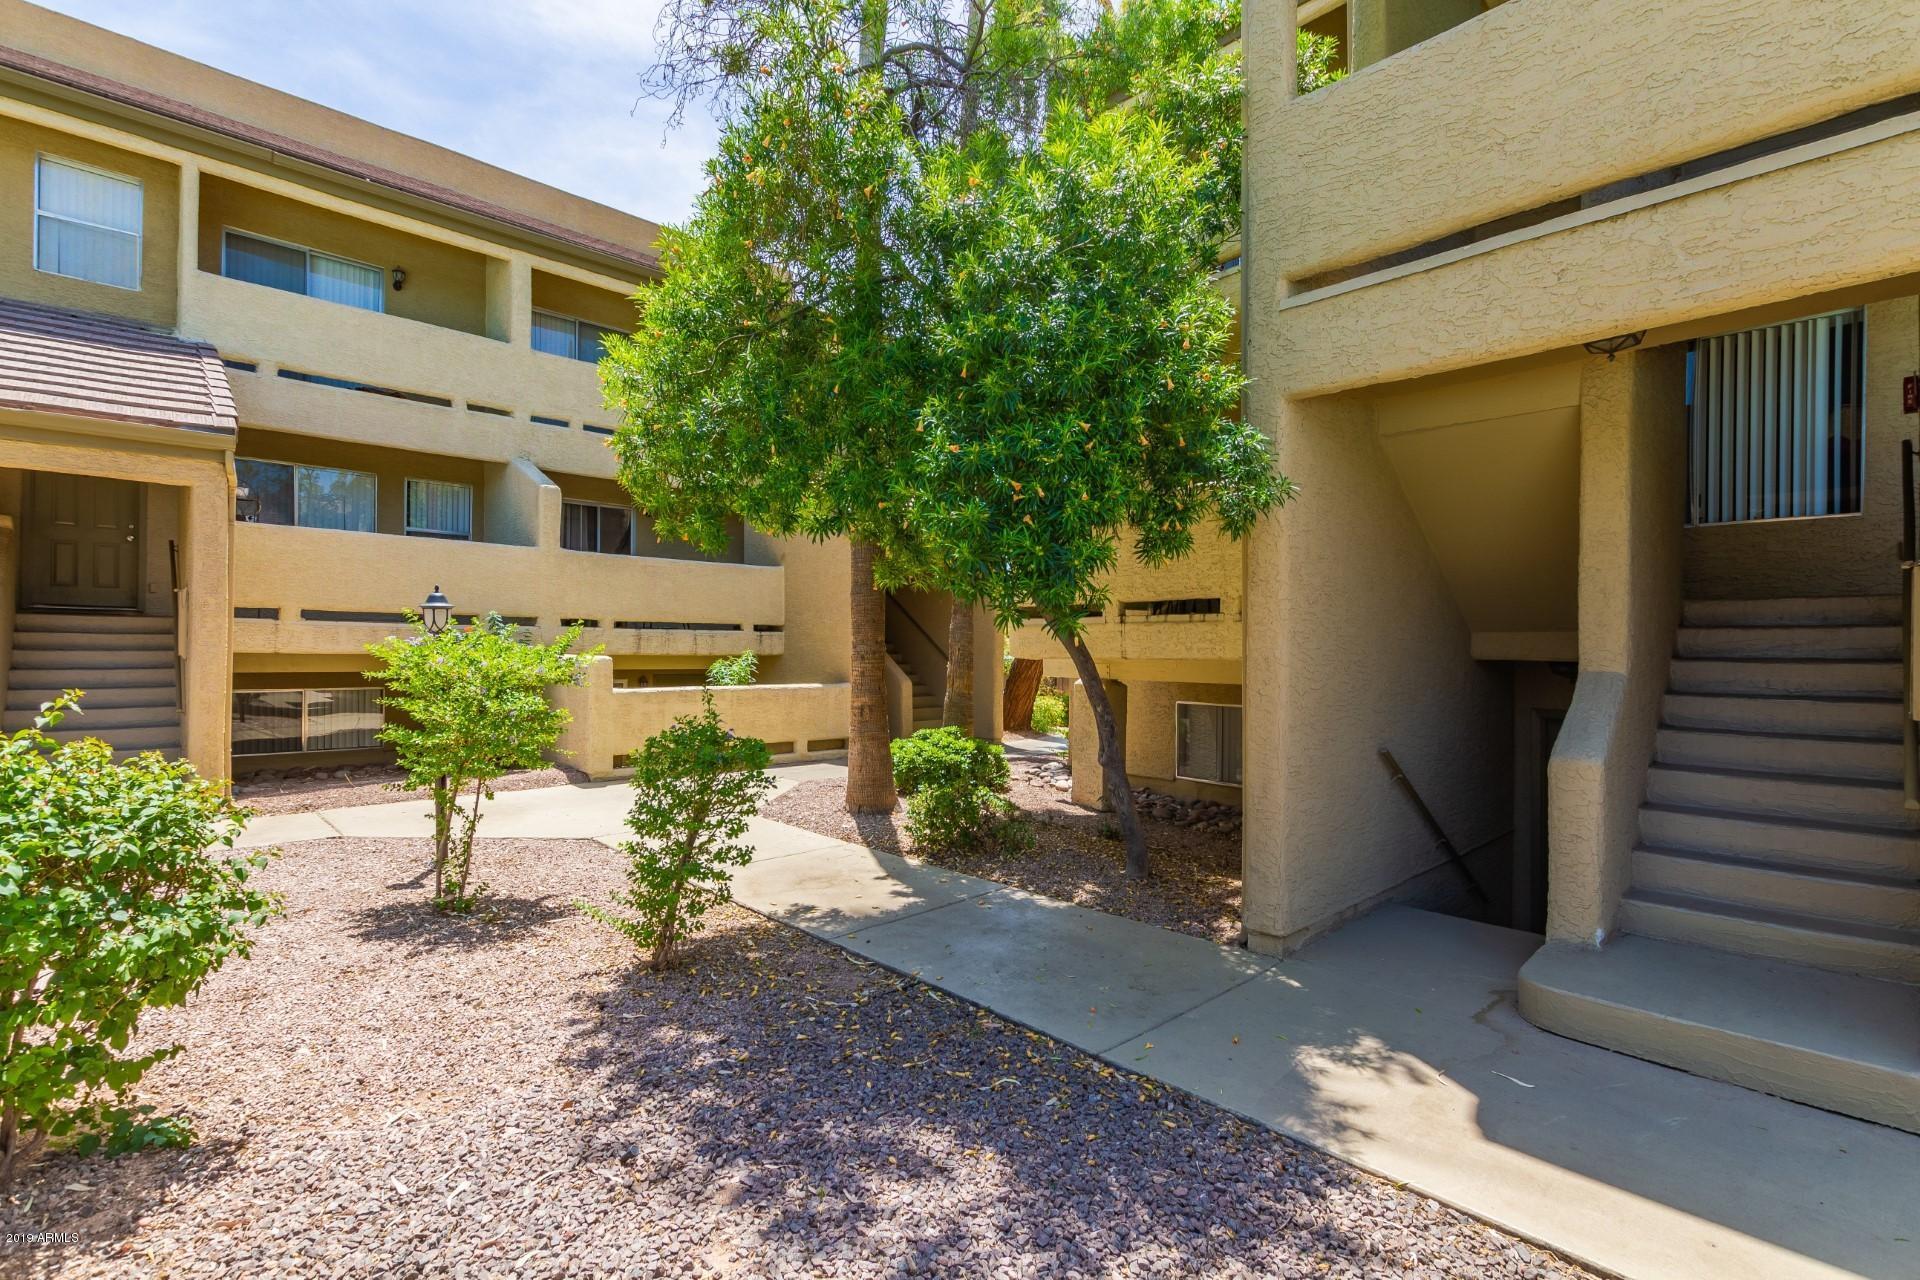 Photo of 1331 W BASELINE Road #230, Mesa, AZ 85202